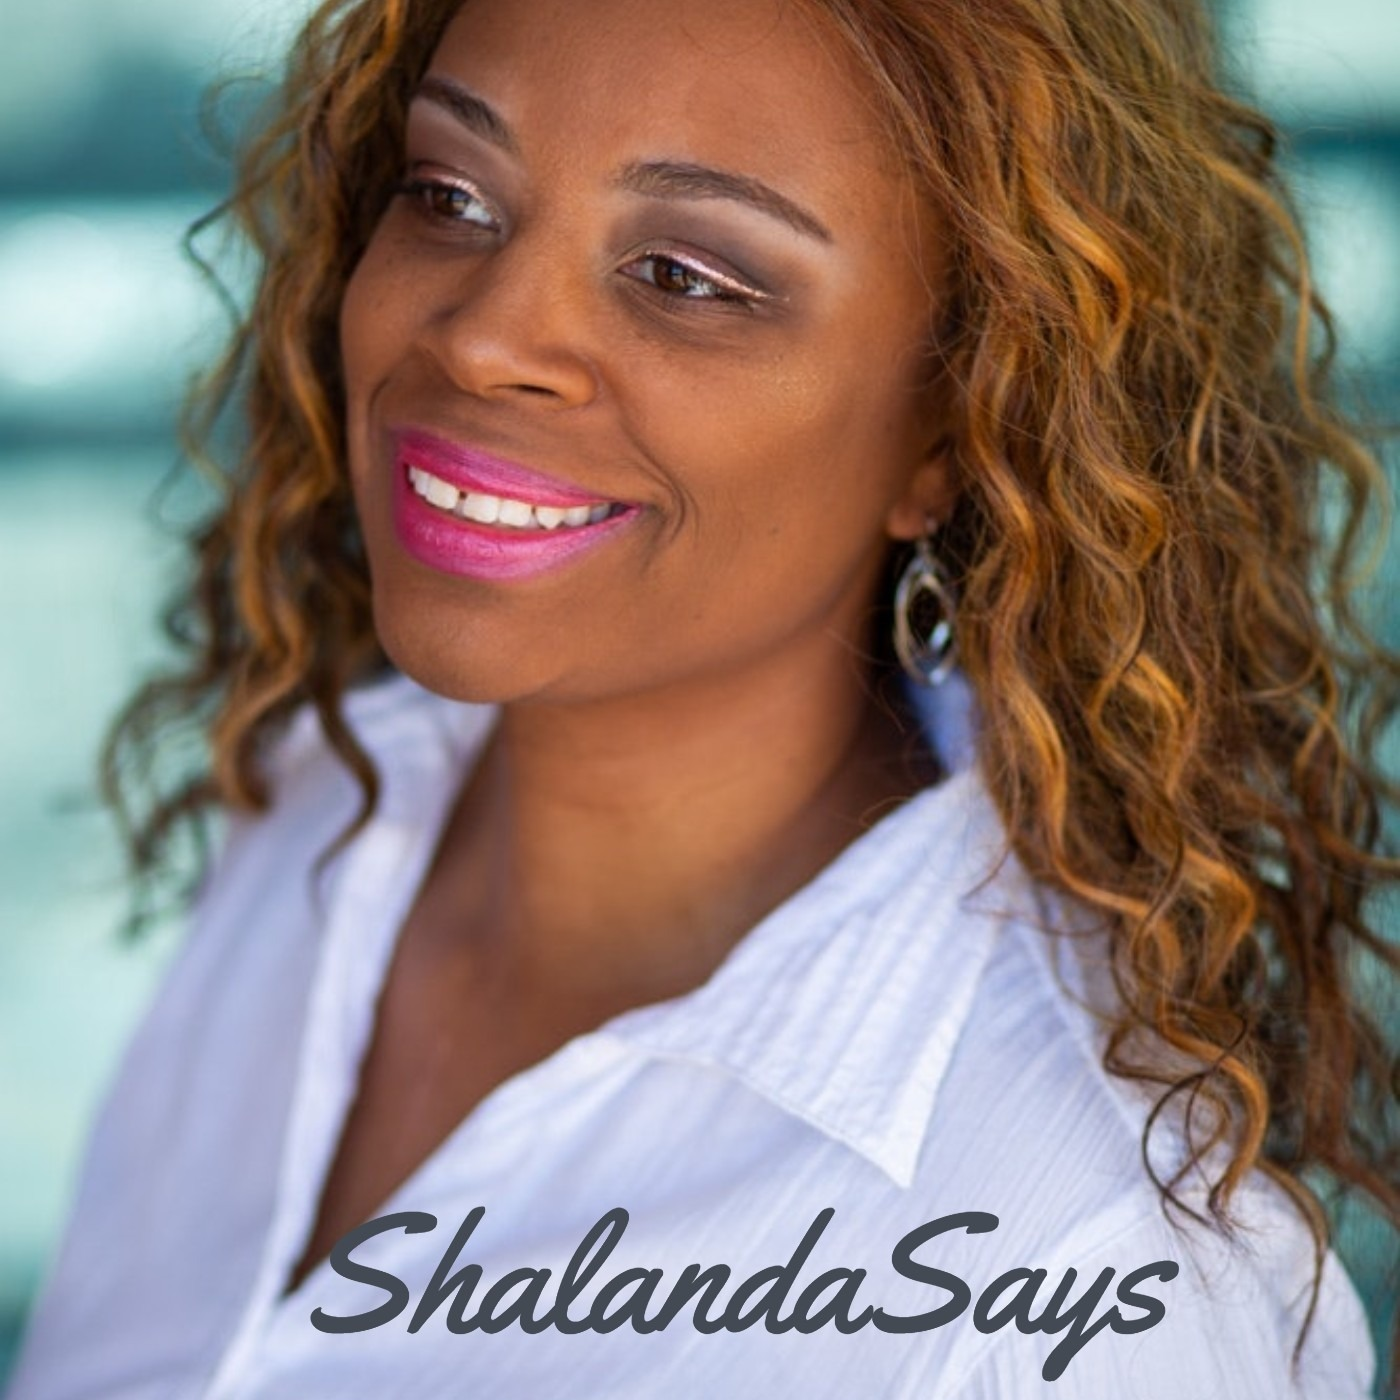 ShalandaSays Meet Author Jamie Lerner